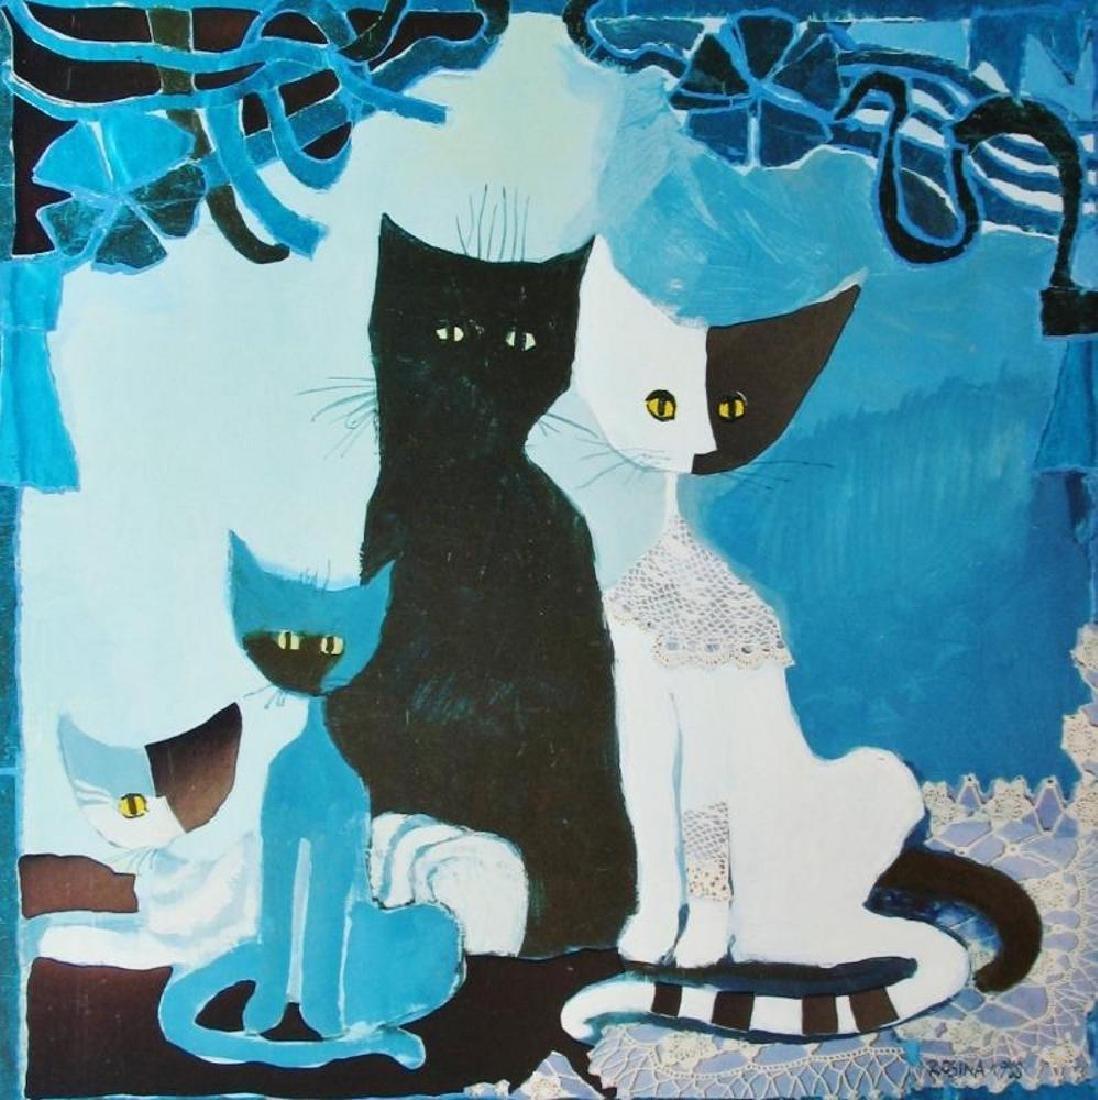 Rosina Wachtmeister Cats Kittens Modern Abstract Art - 3